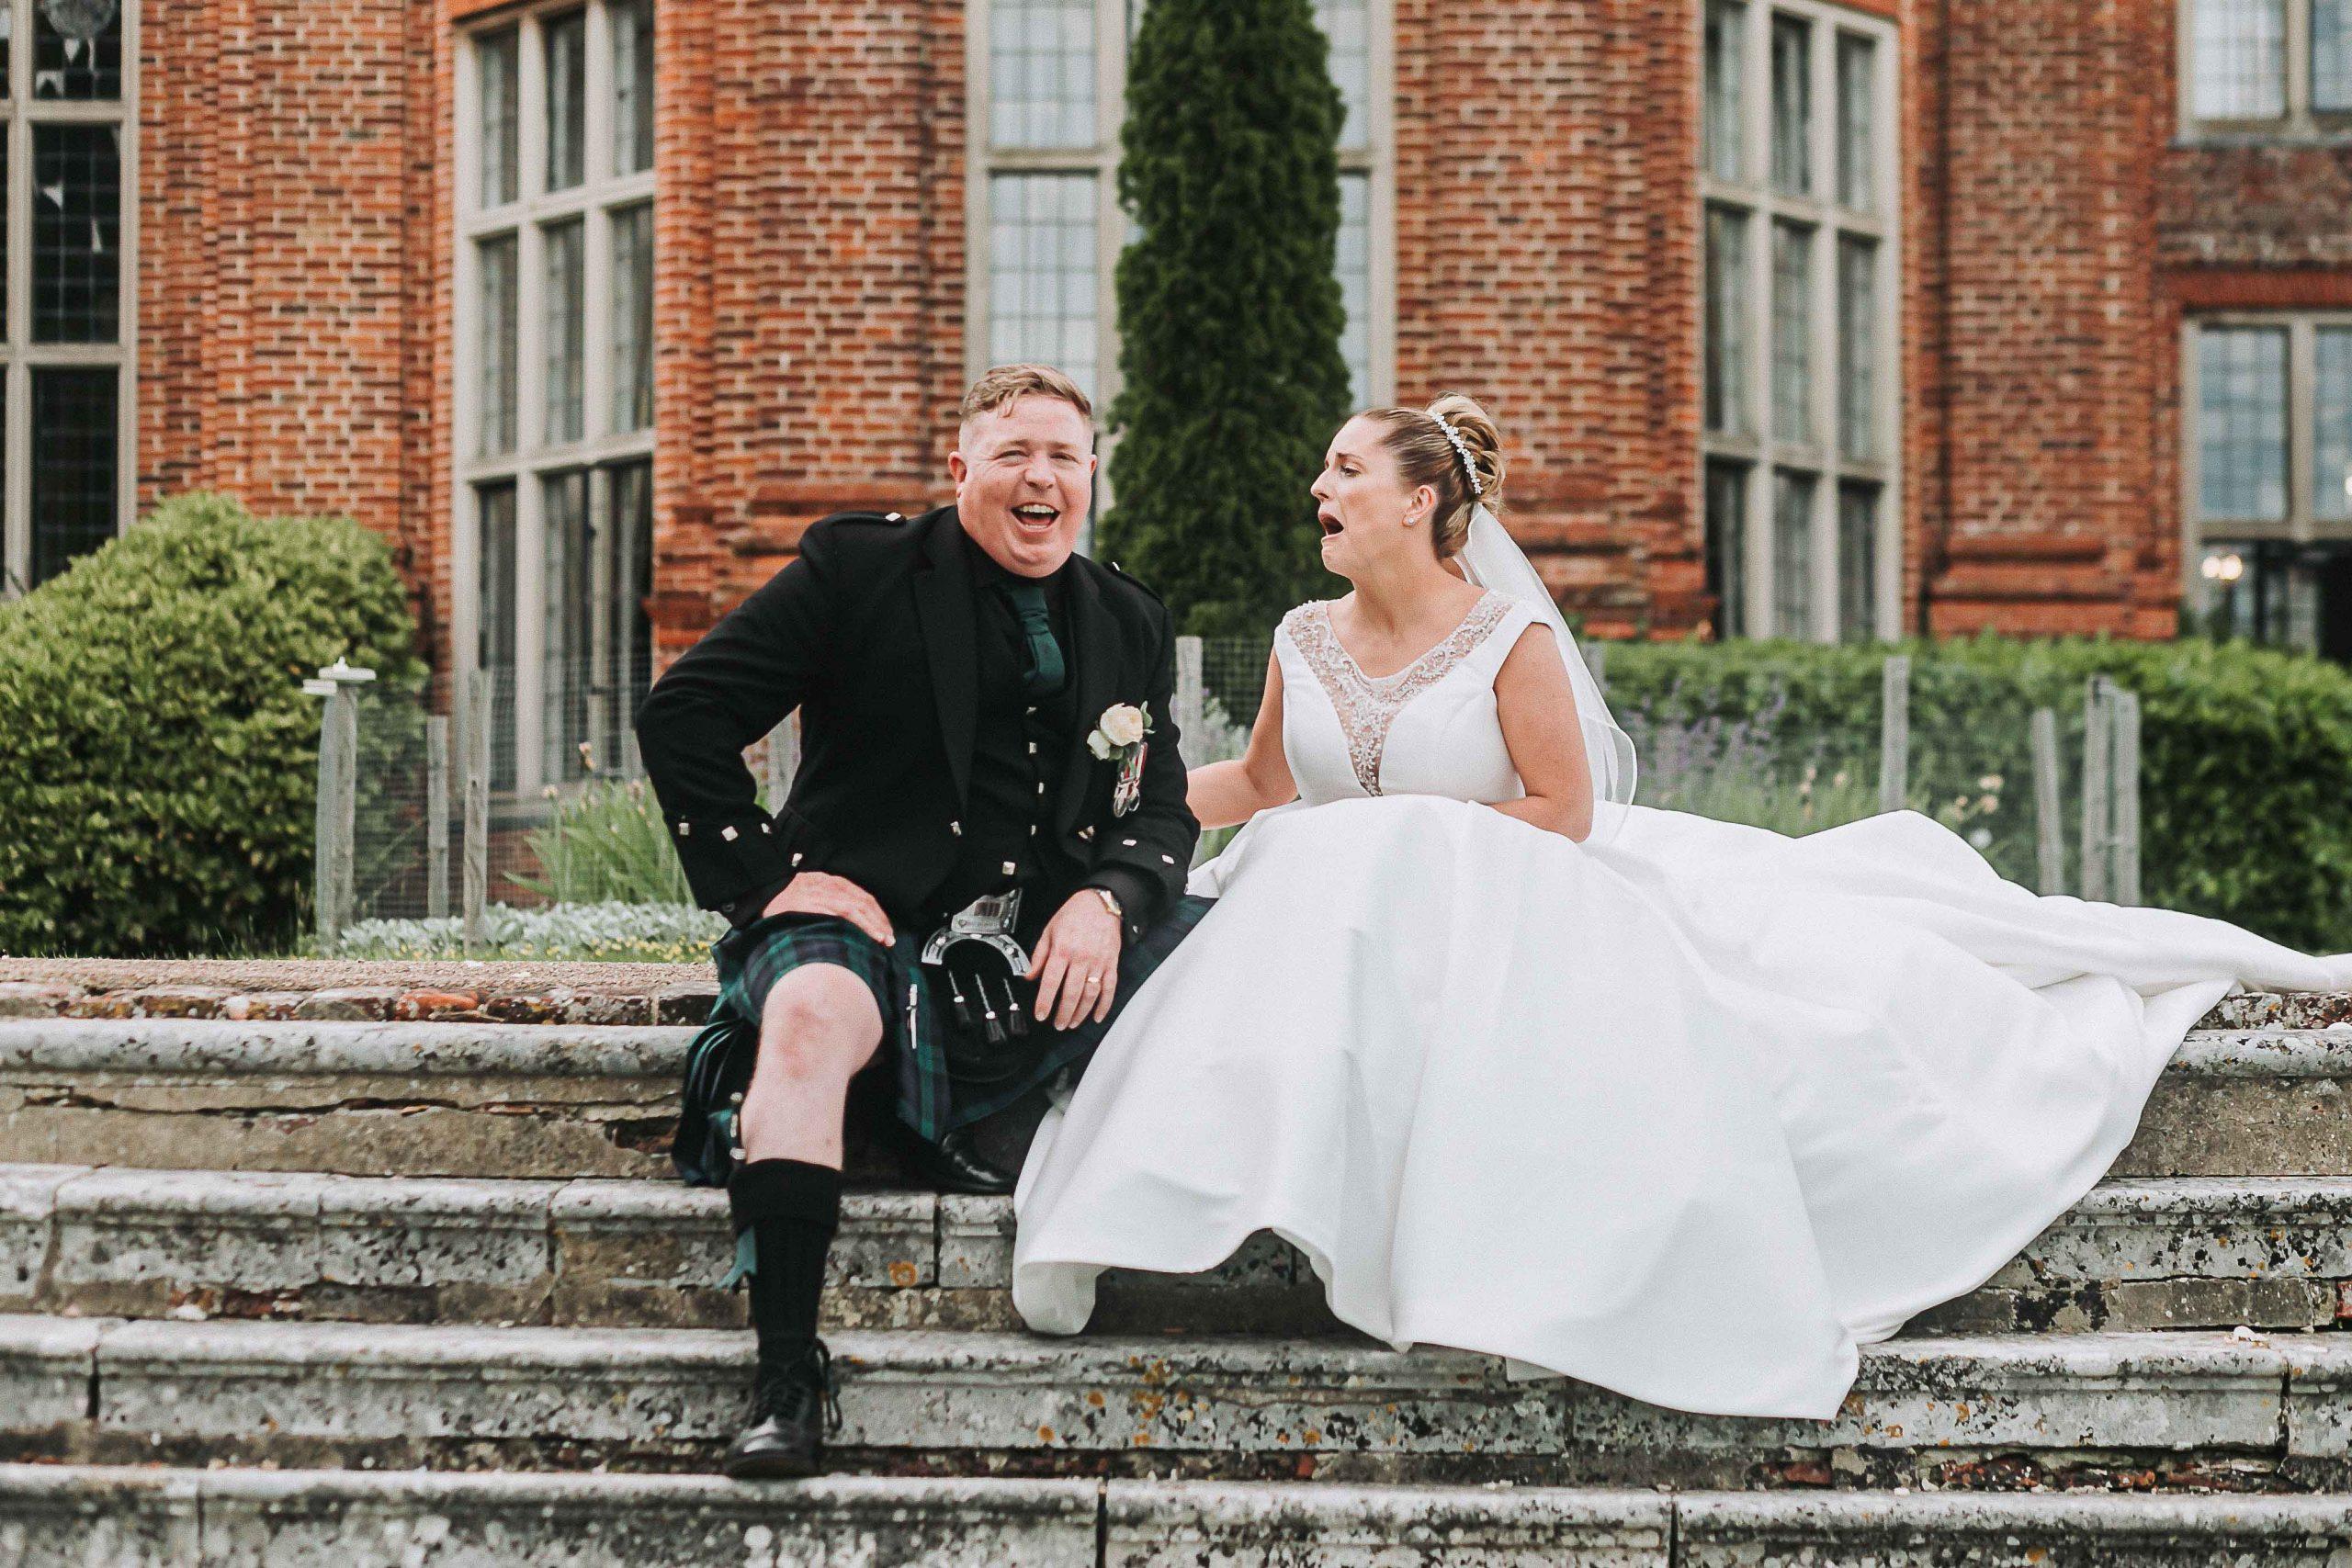 wedding portraits at a Broome Park wedding